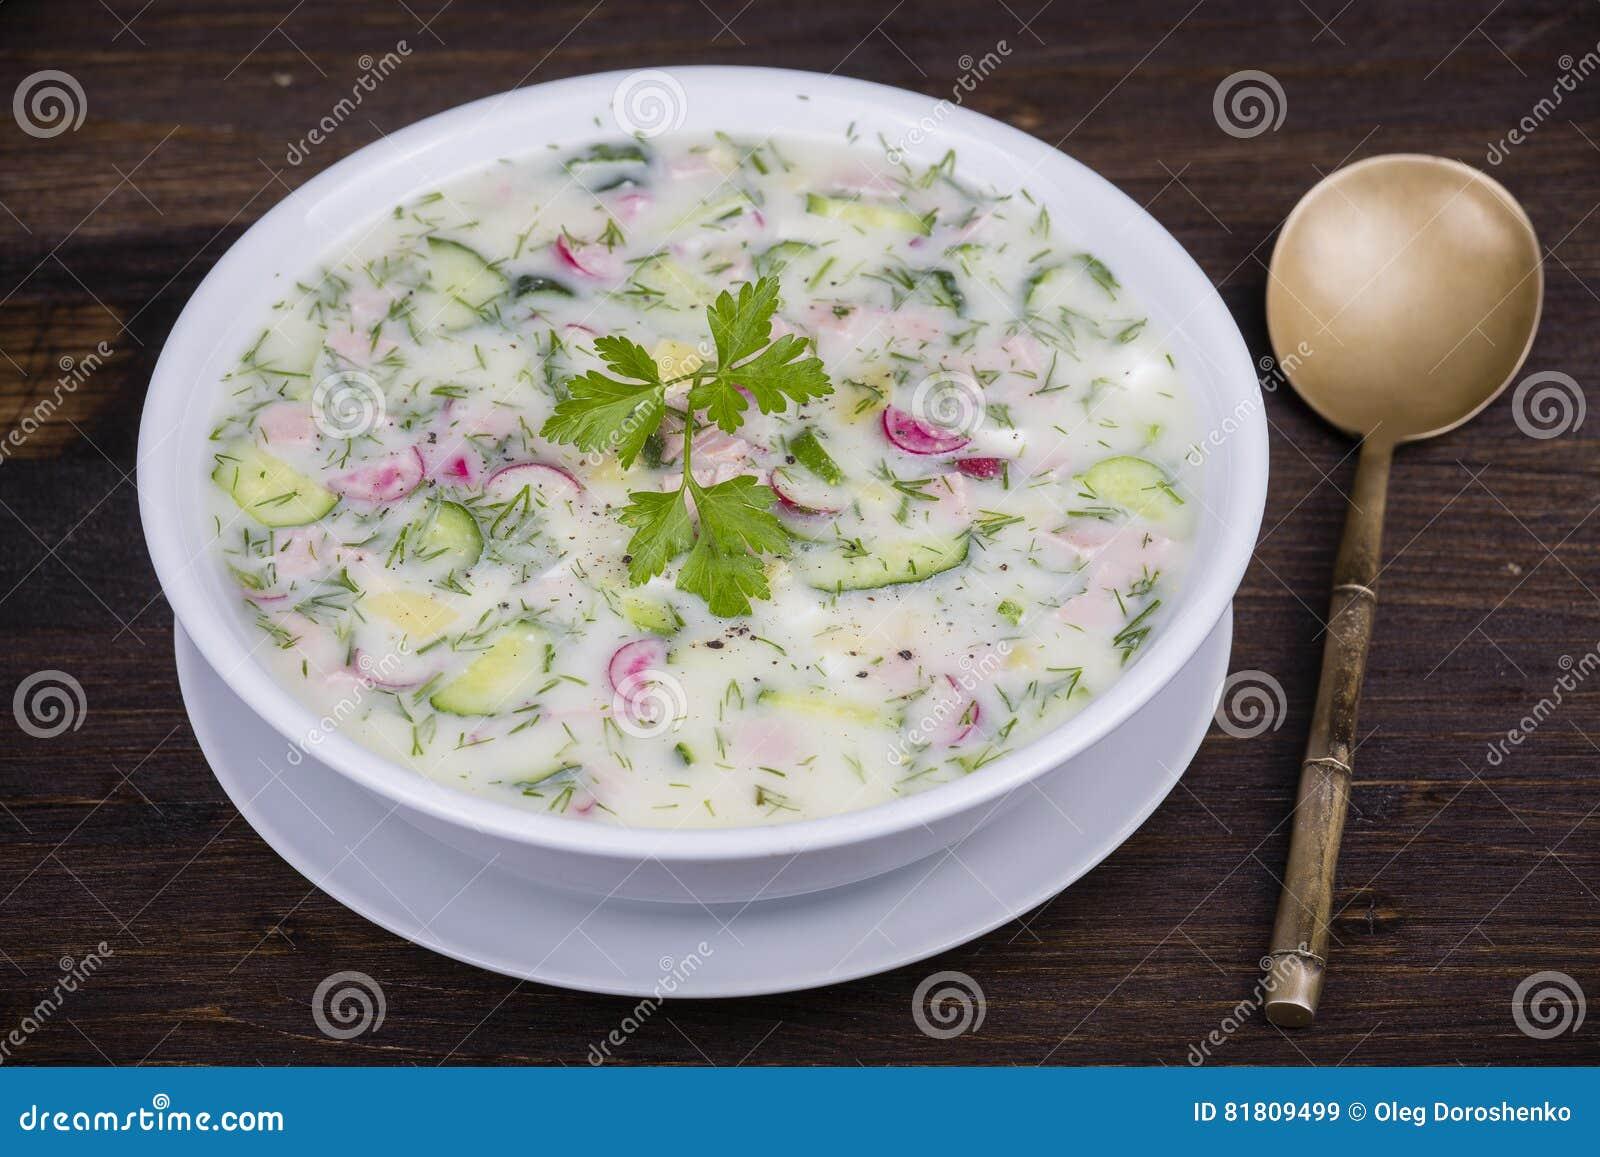 Холодный овощной суп на югурте, основании кисл-молока - okroshka